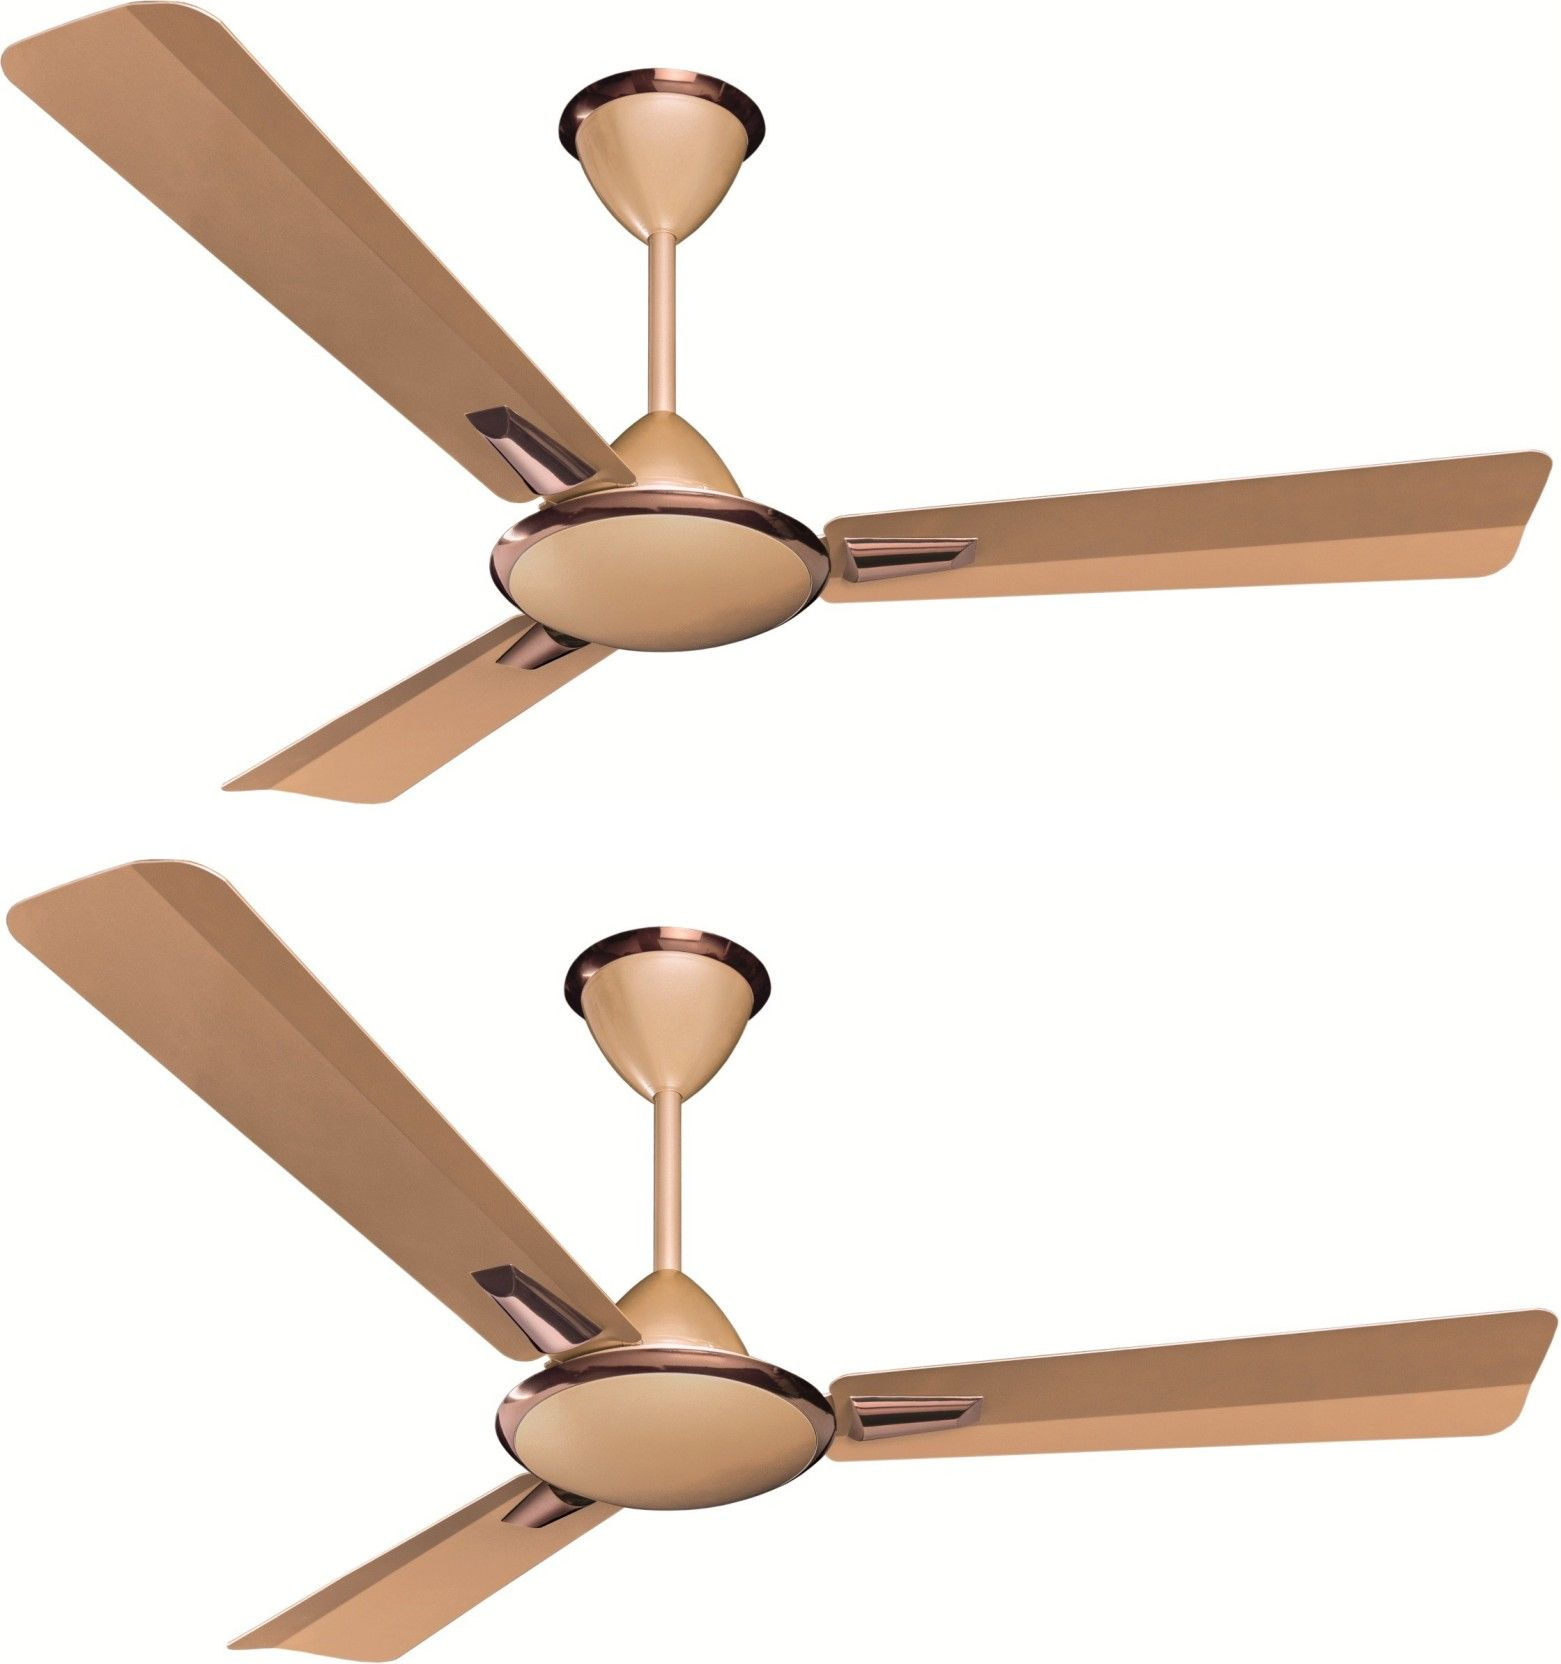 Crompton Aura 48 Inch Anti Dust High Speed Ceiling Fan Ceiling Fan Ceiling Fan Price Fan Price